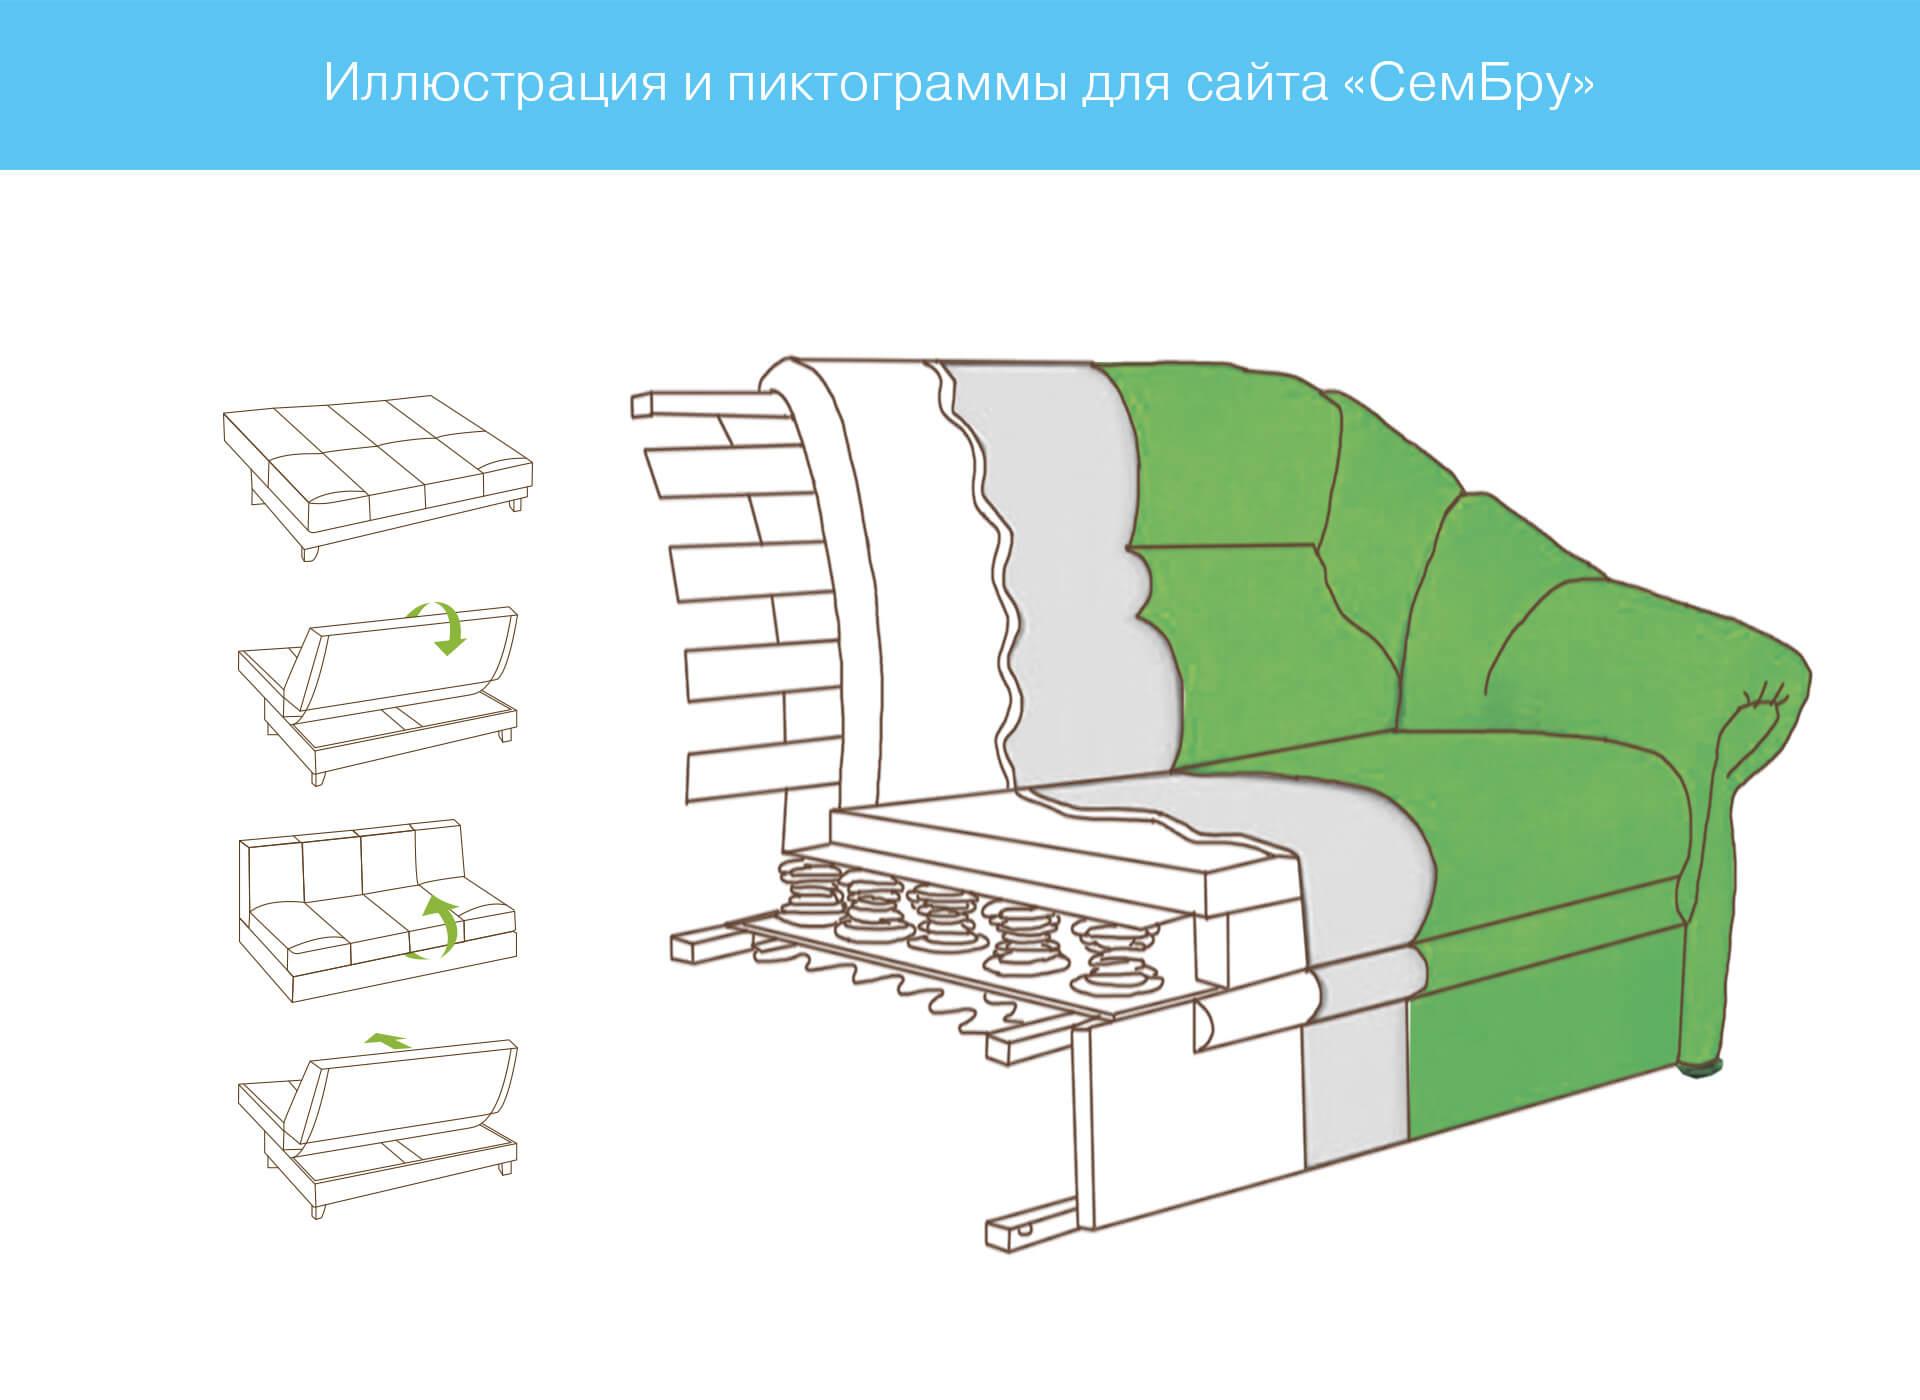 prokochuk_irina_logo_website-design_sembru_7